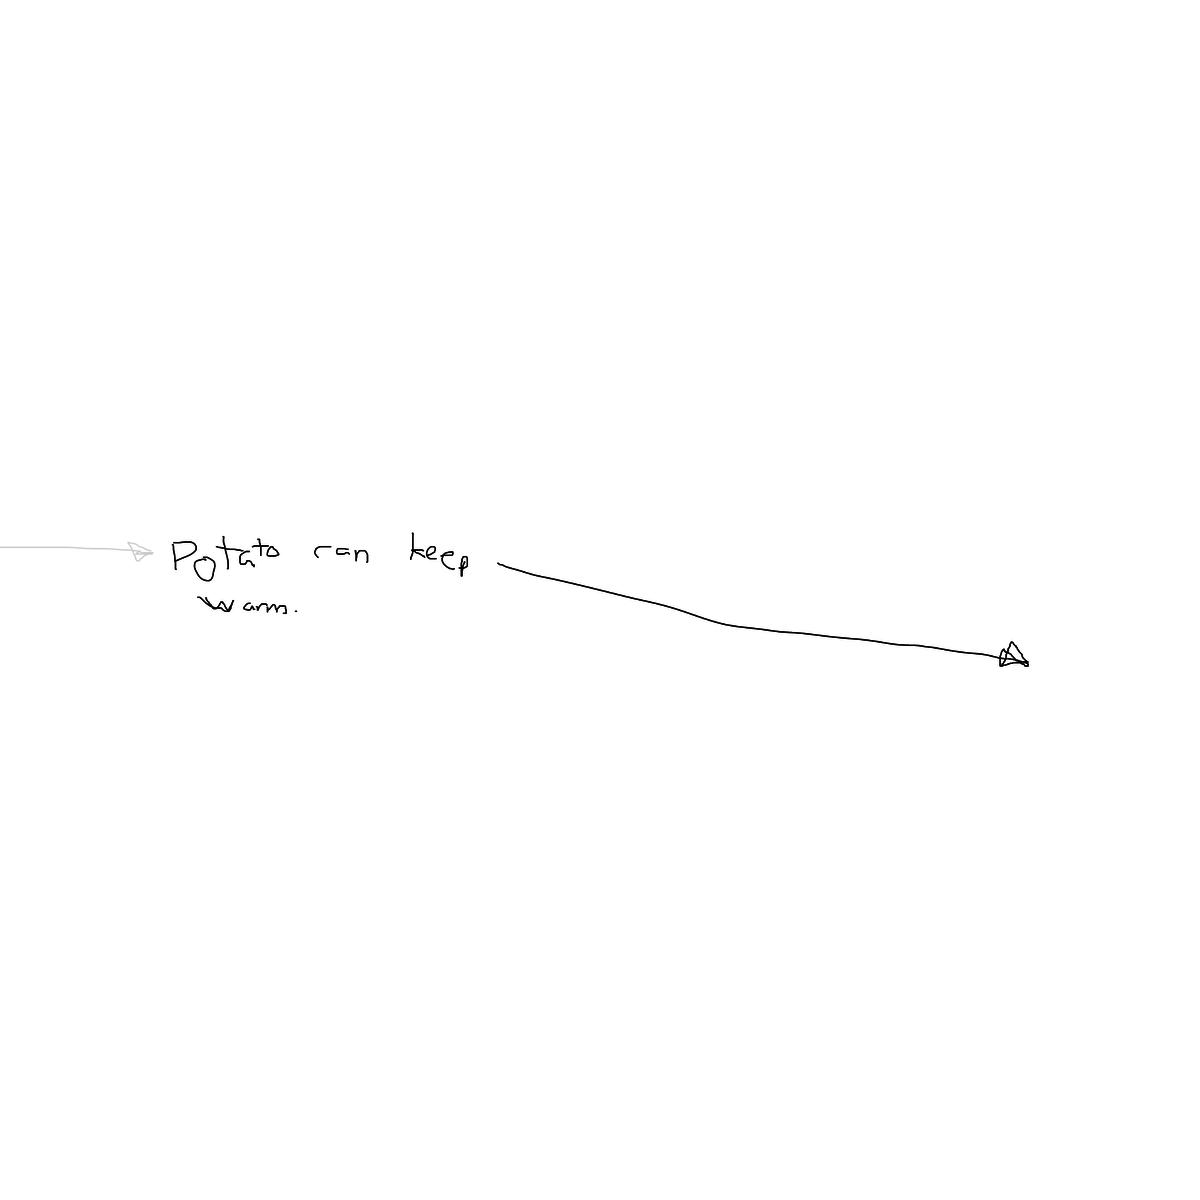 BAAAM drawing#17581 lat:56.5599975585937500lng: 25.4611072540283200